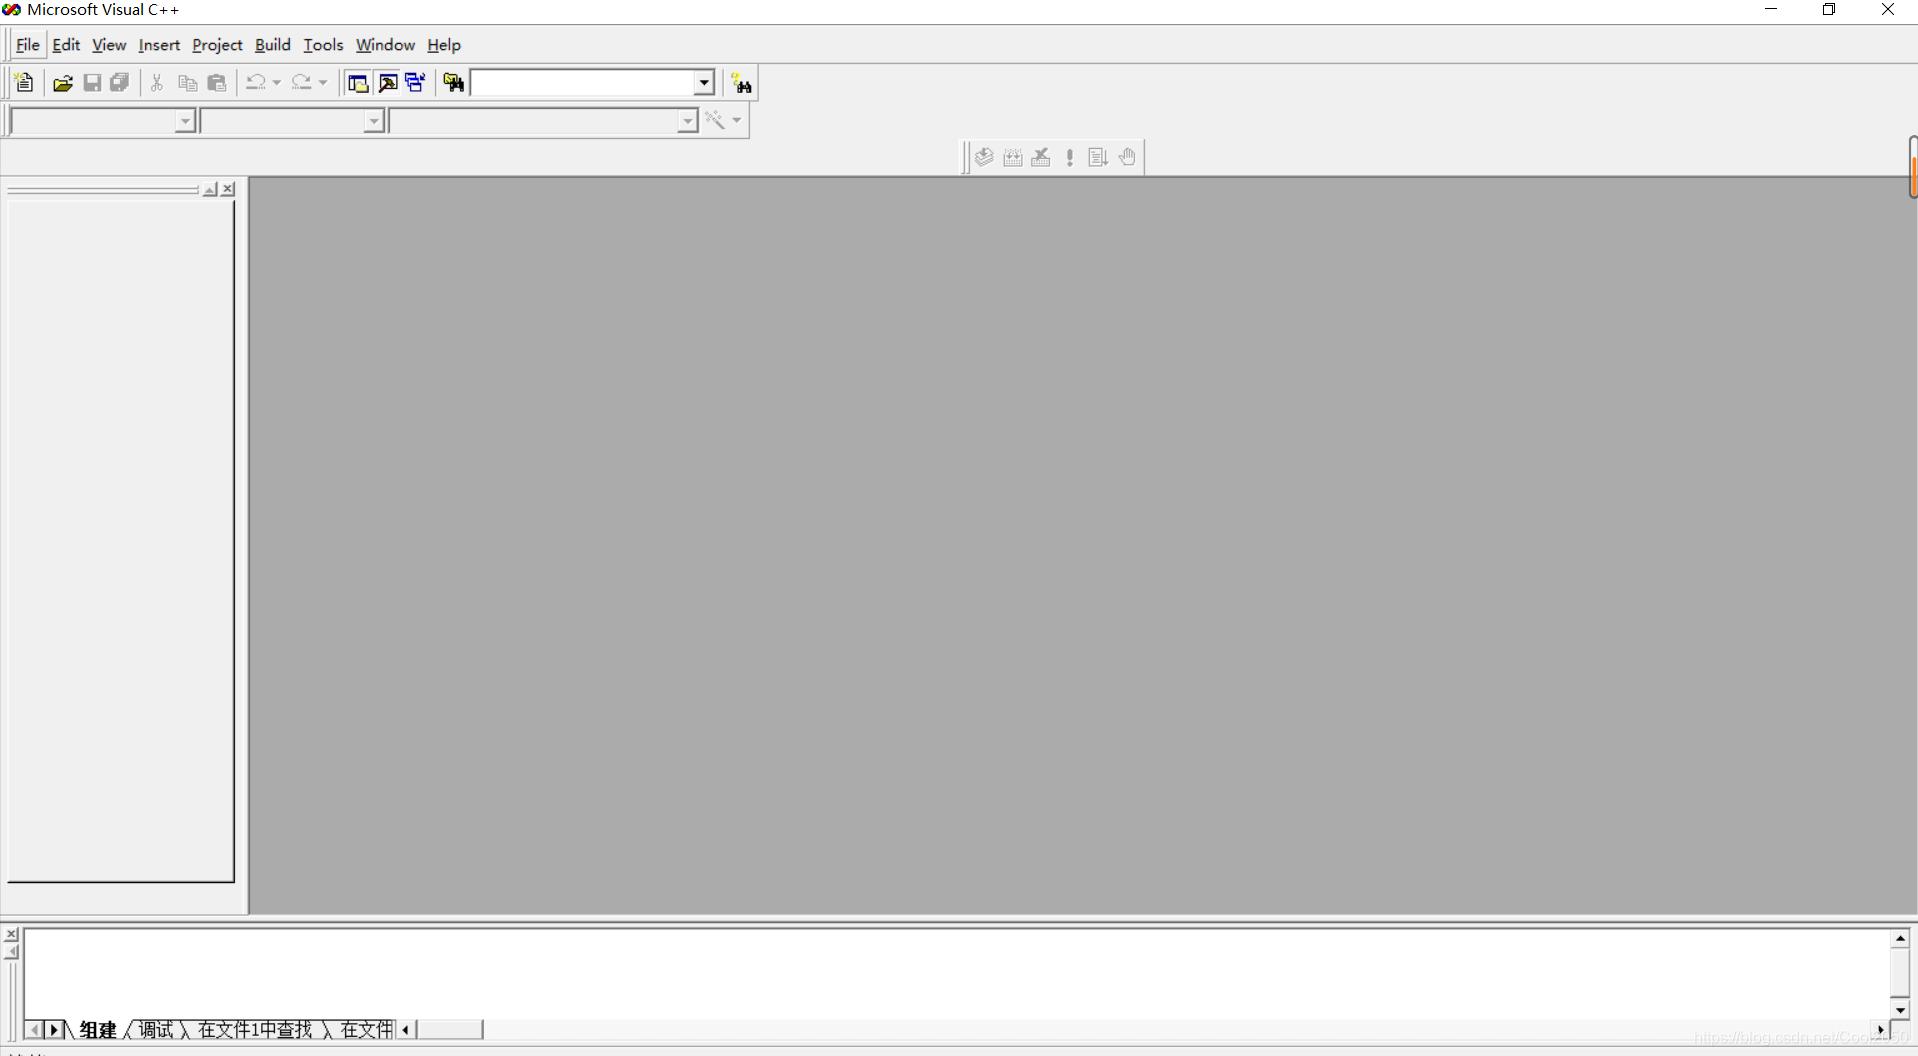 Visual c++ 6.0初始界面